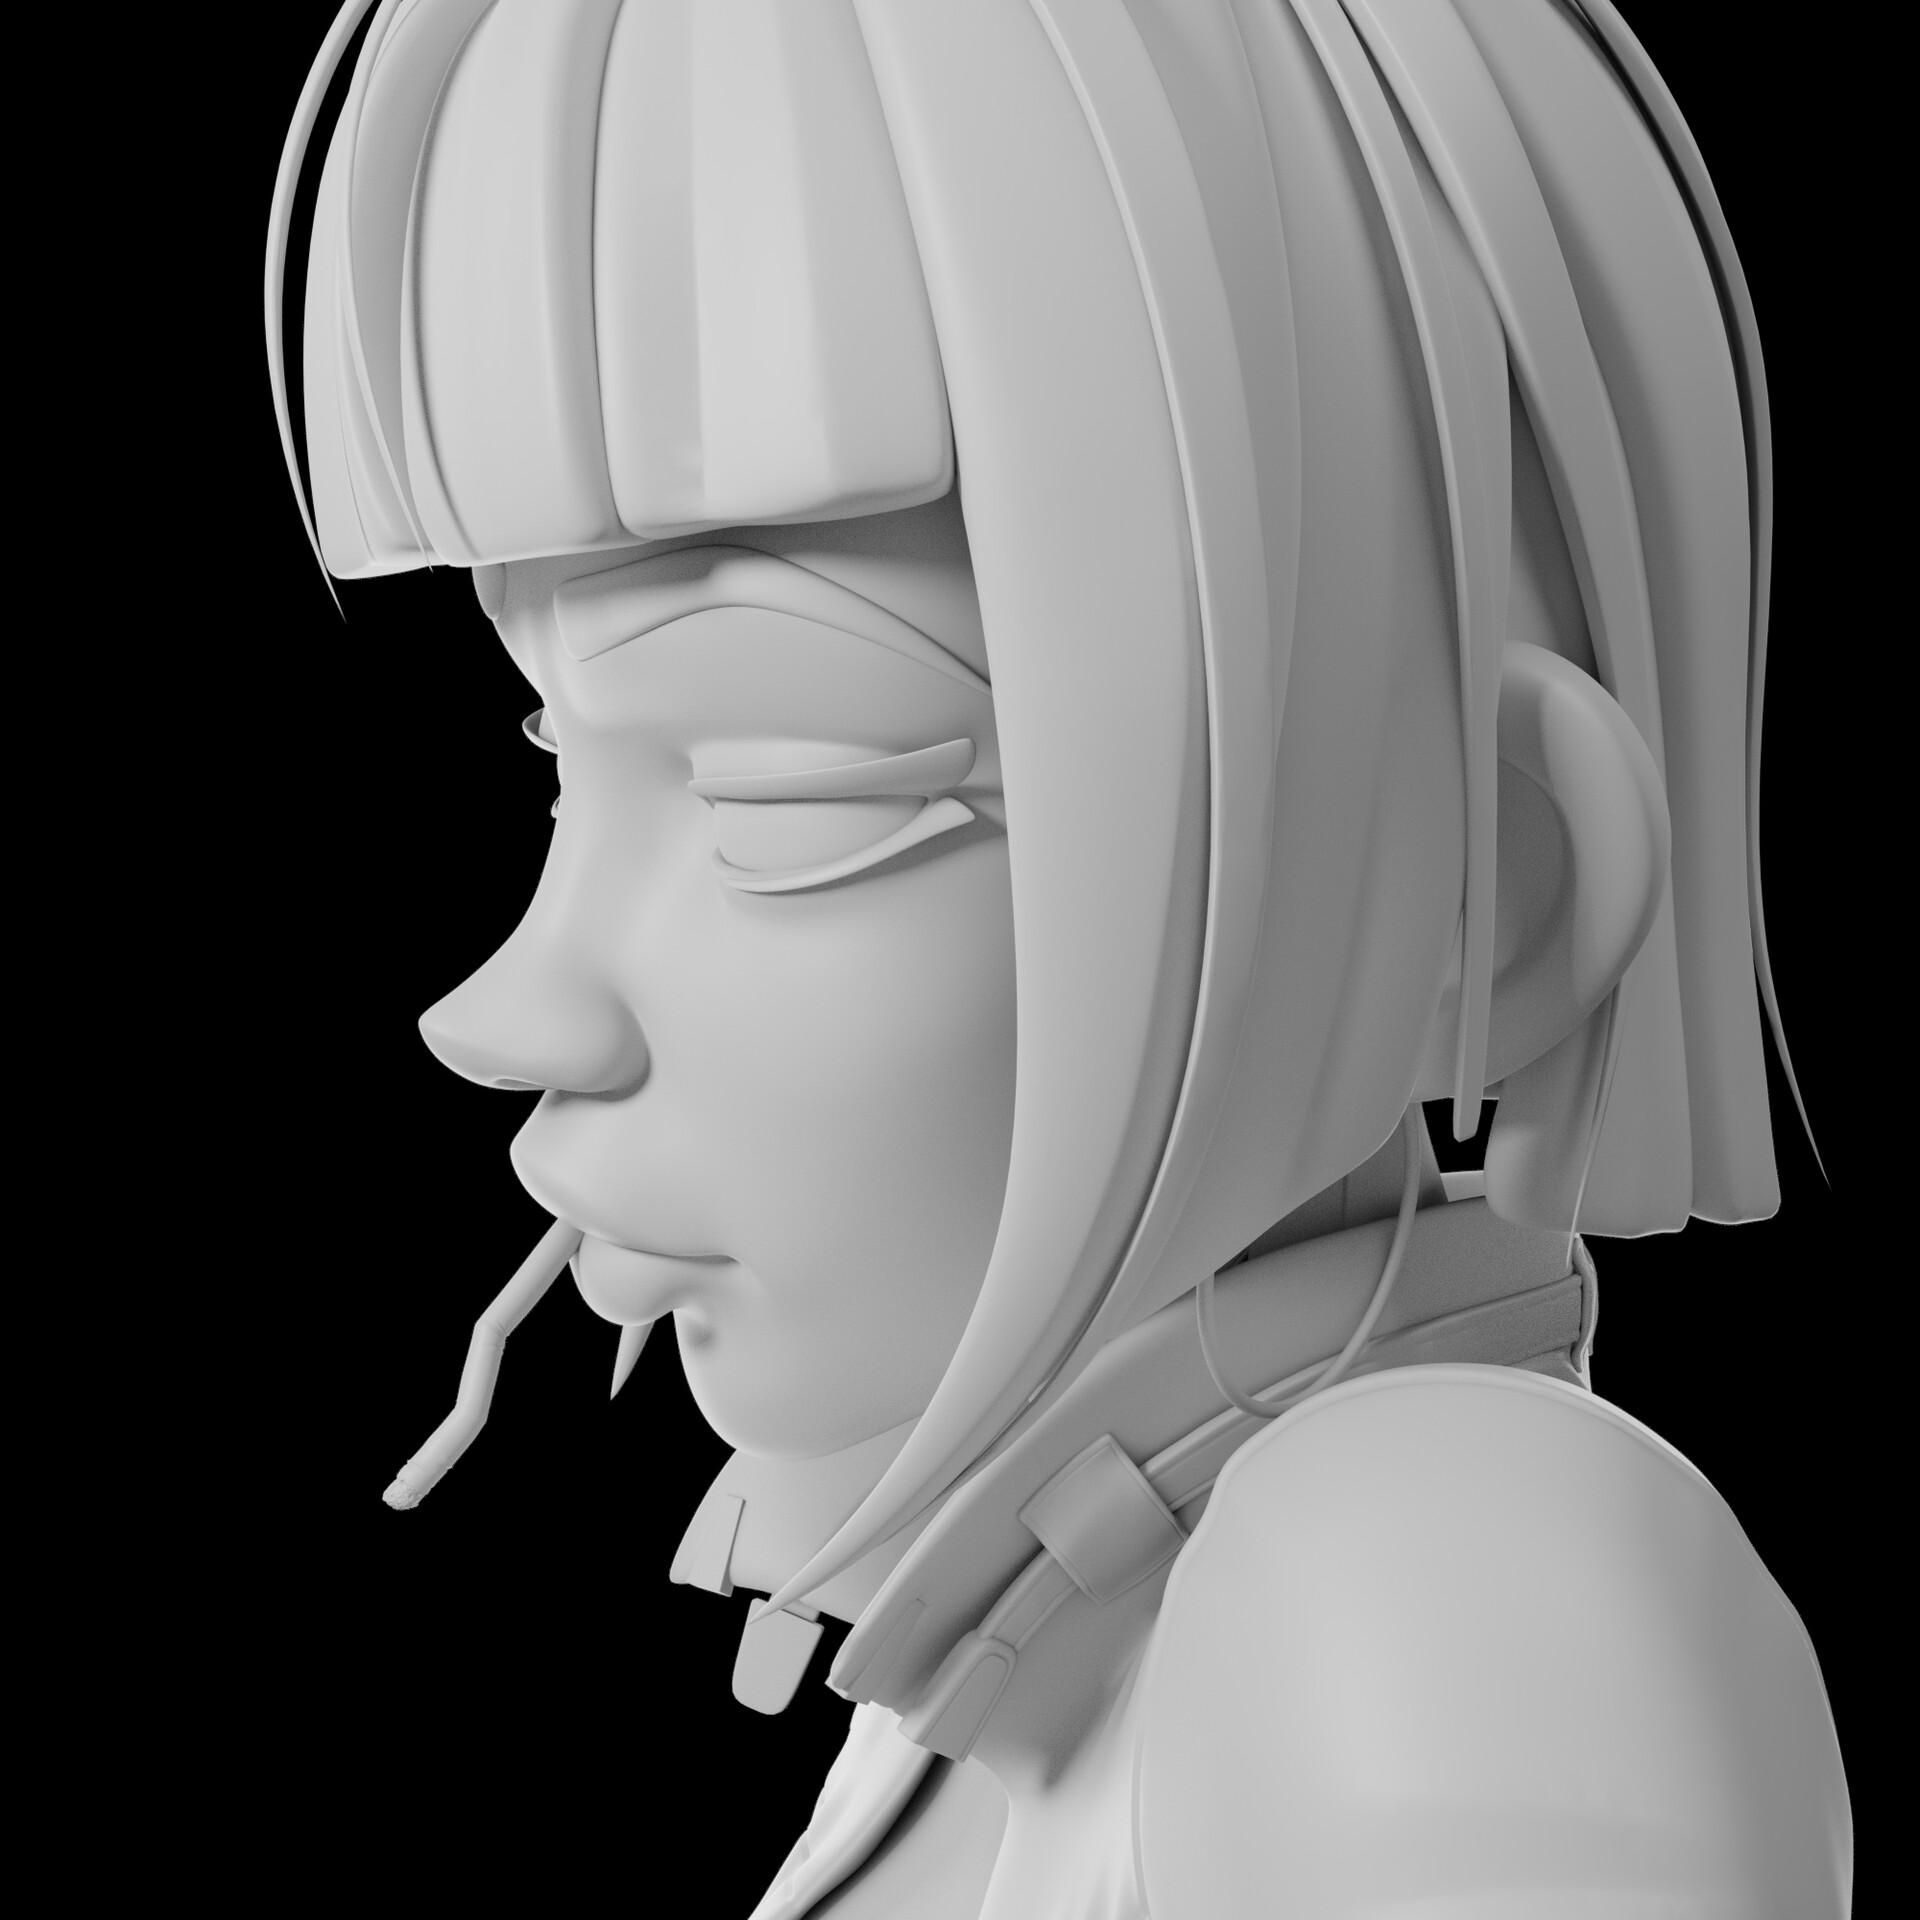 Sergi camprubi detail clay render 01